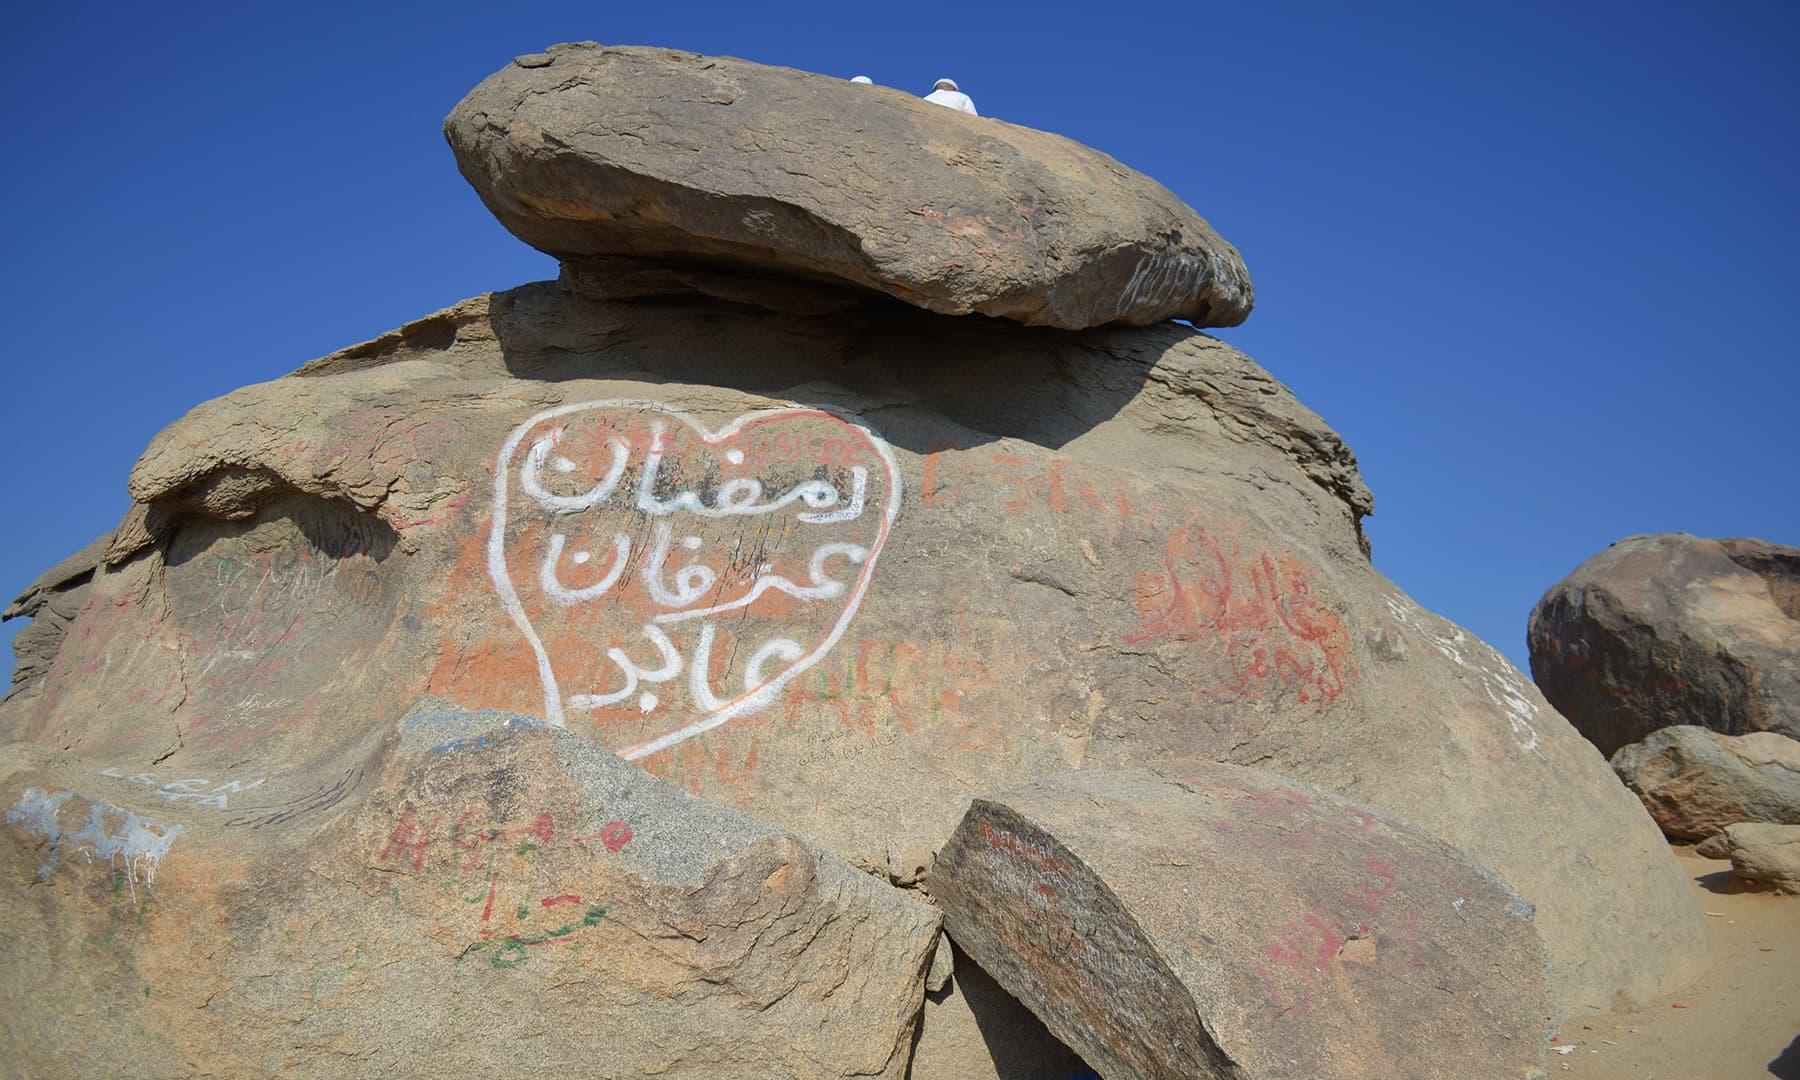 غار ثور اور آس پاس کا علاقہ — تصویر رمضان رفیق